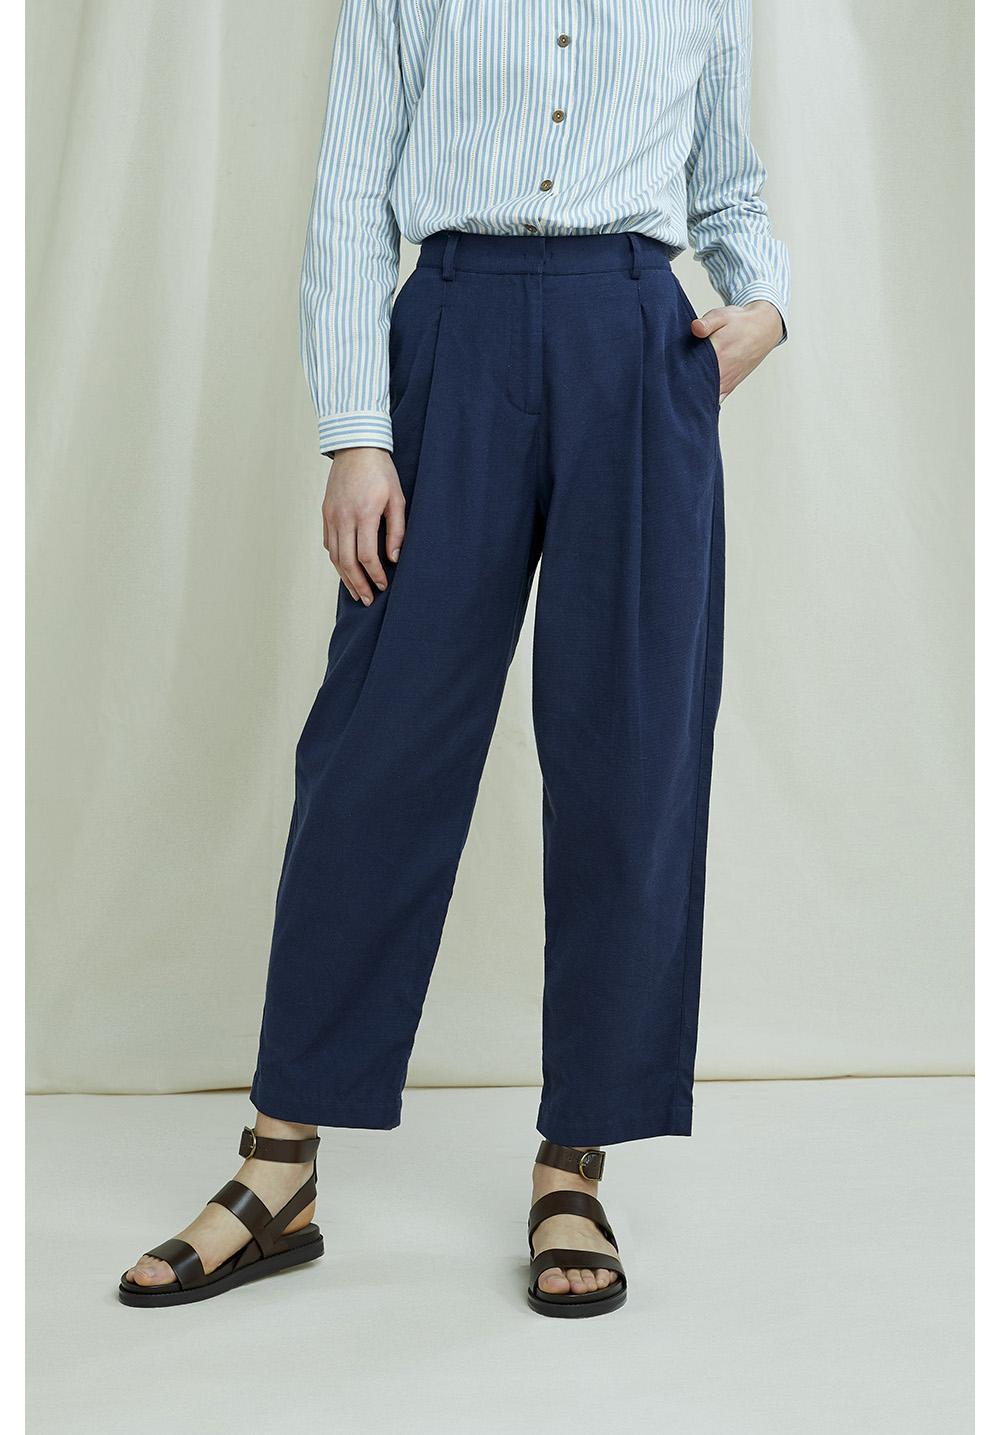 Helka Trousers In Navy 12